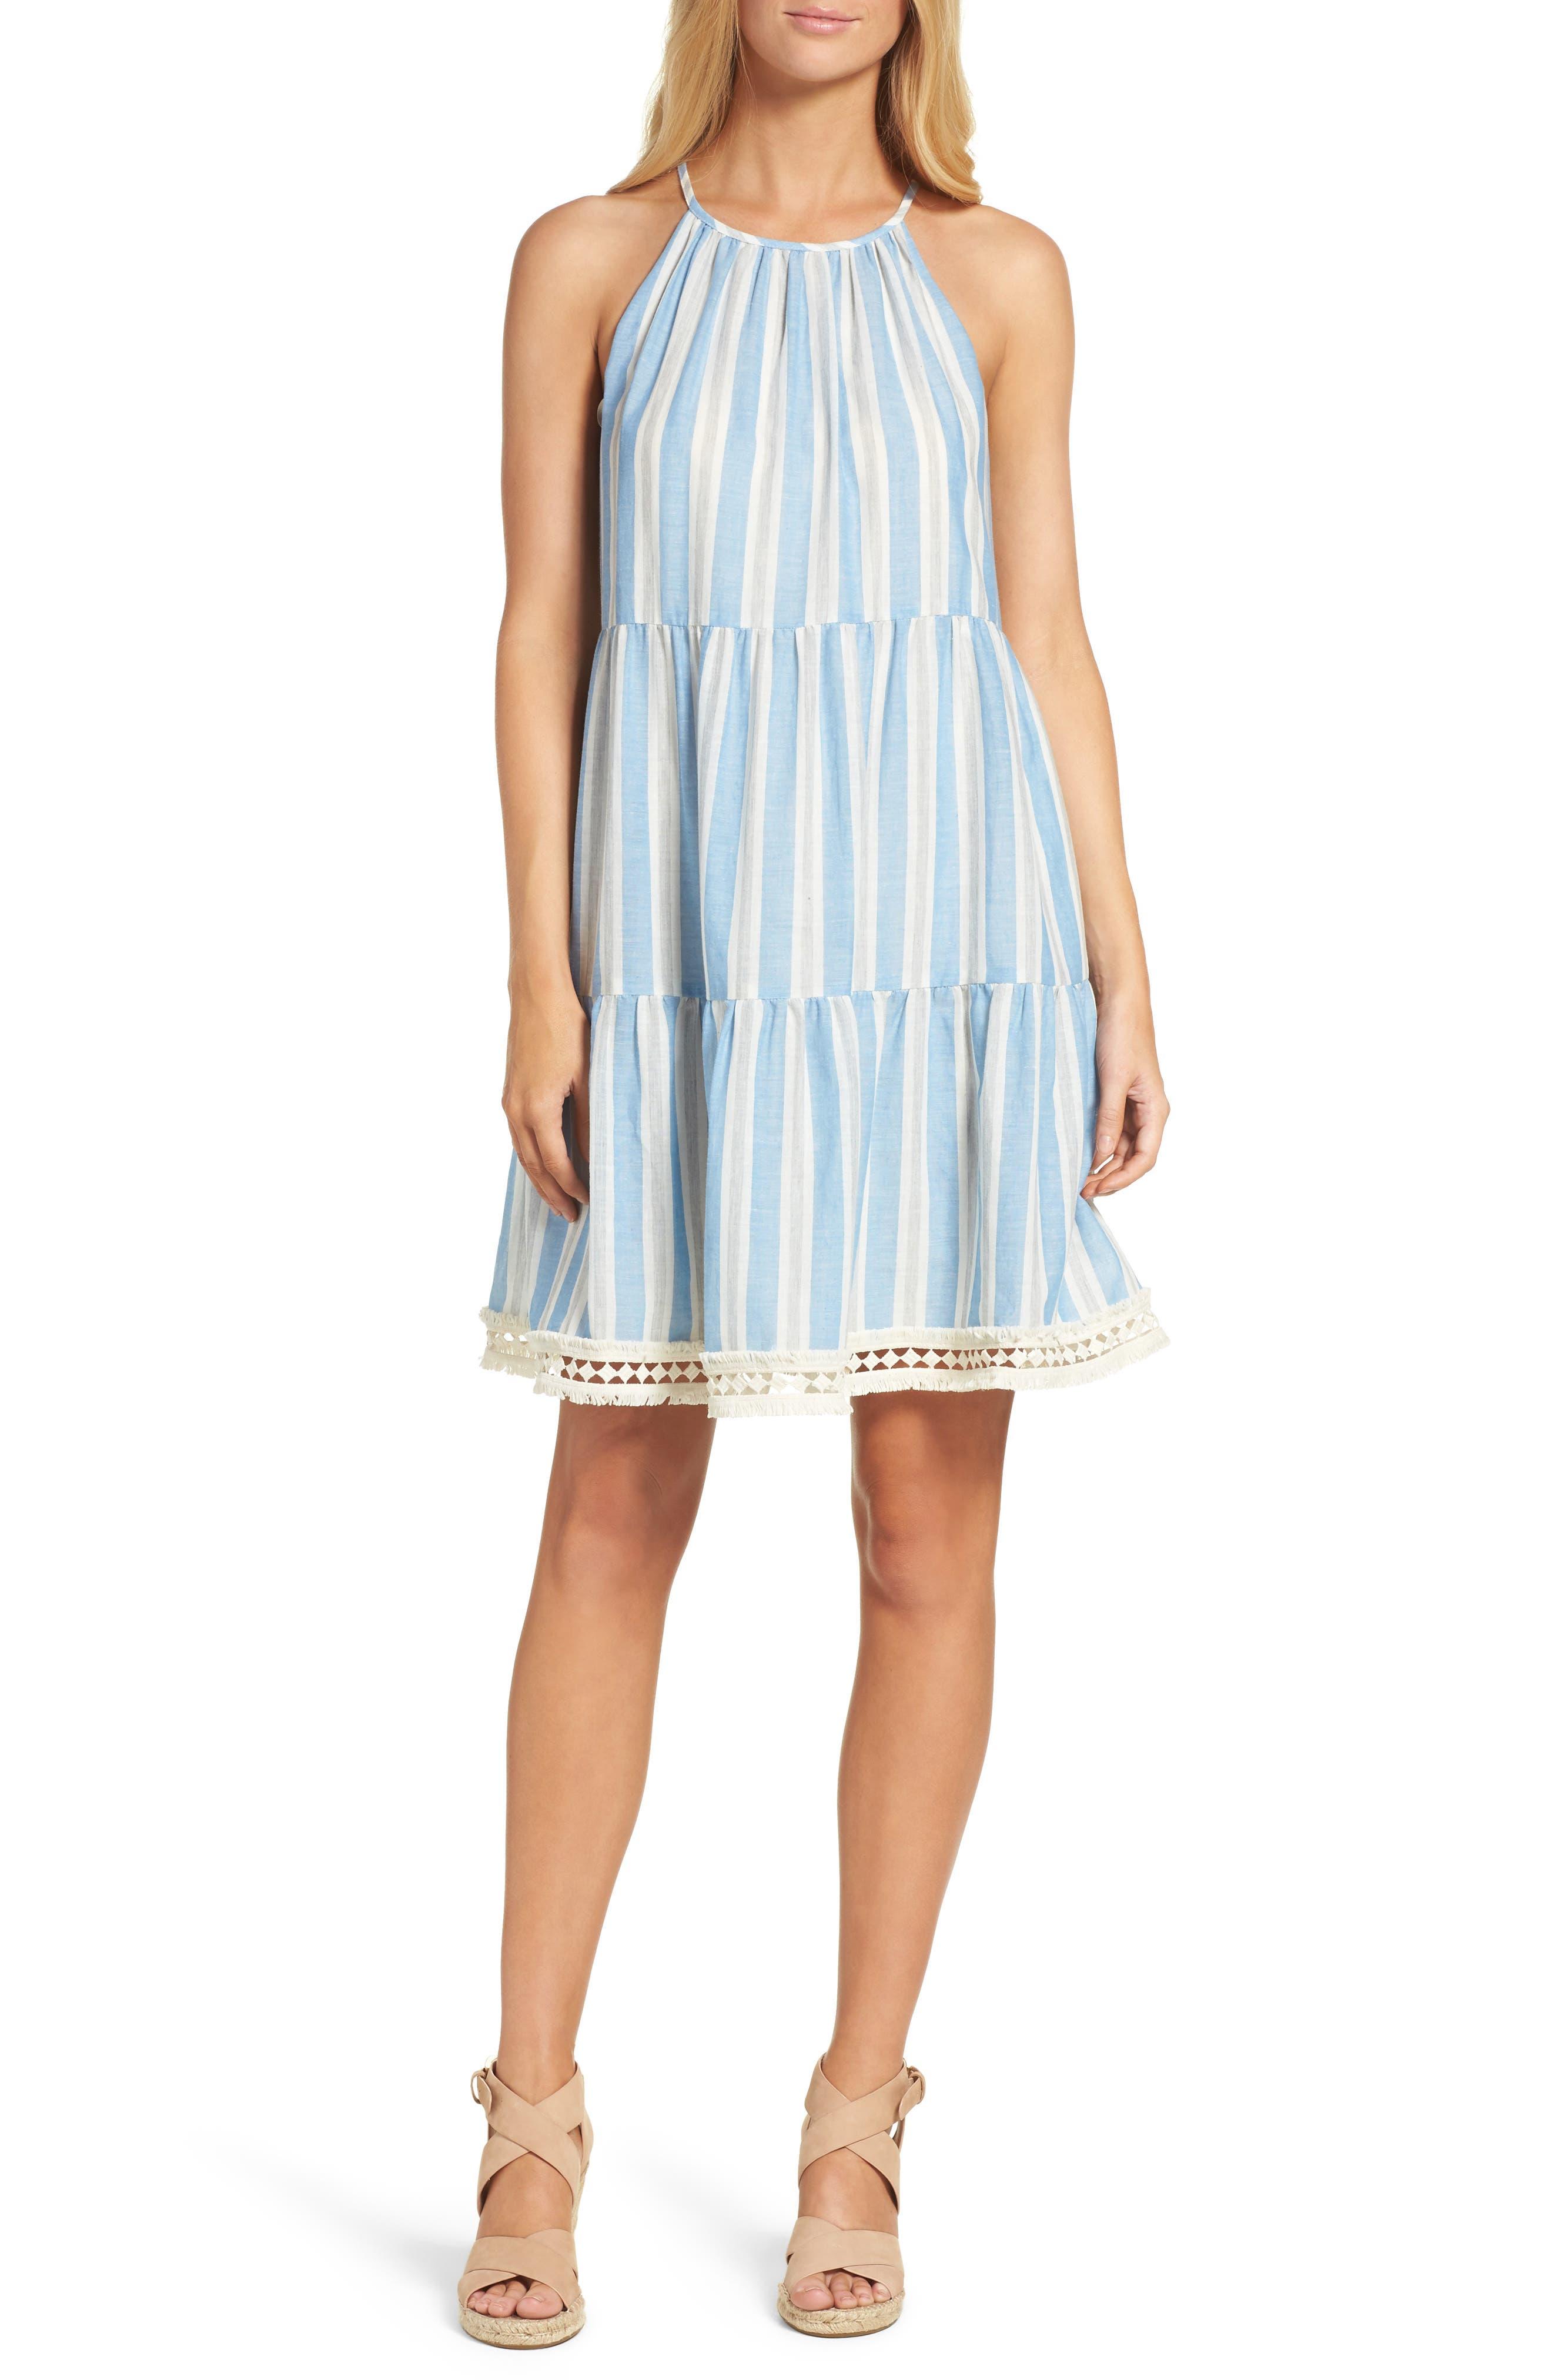 Alternate Image 1 Selected - Maggy London Stripe Shift Dress (Regular & Petite)